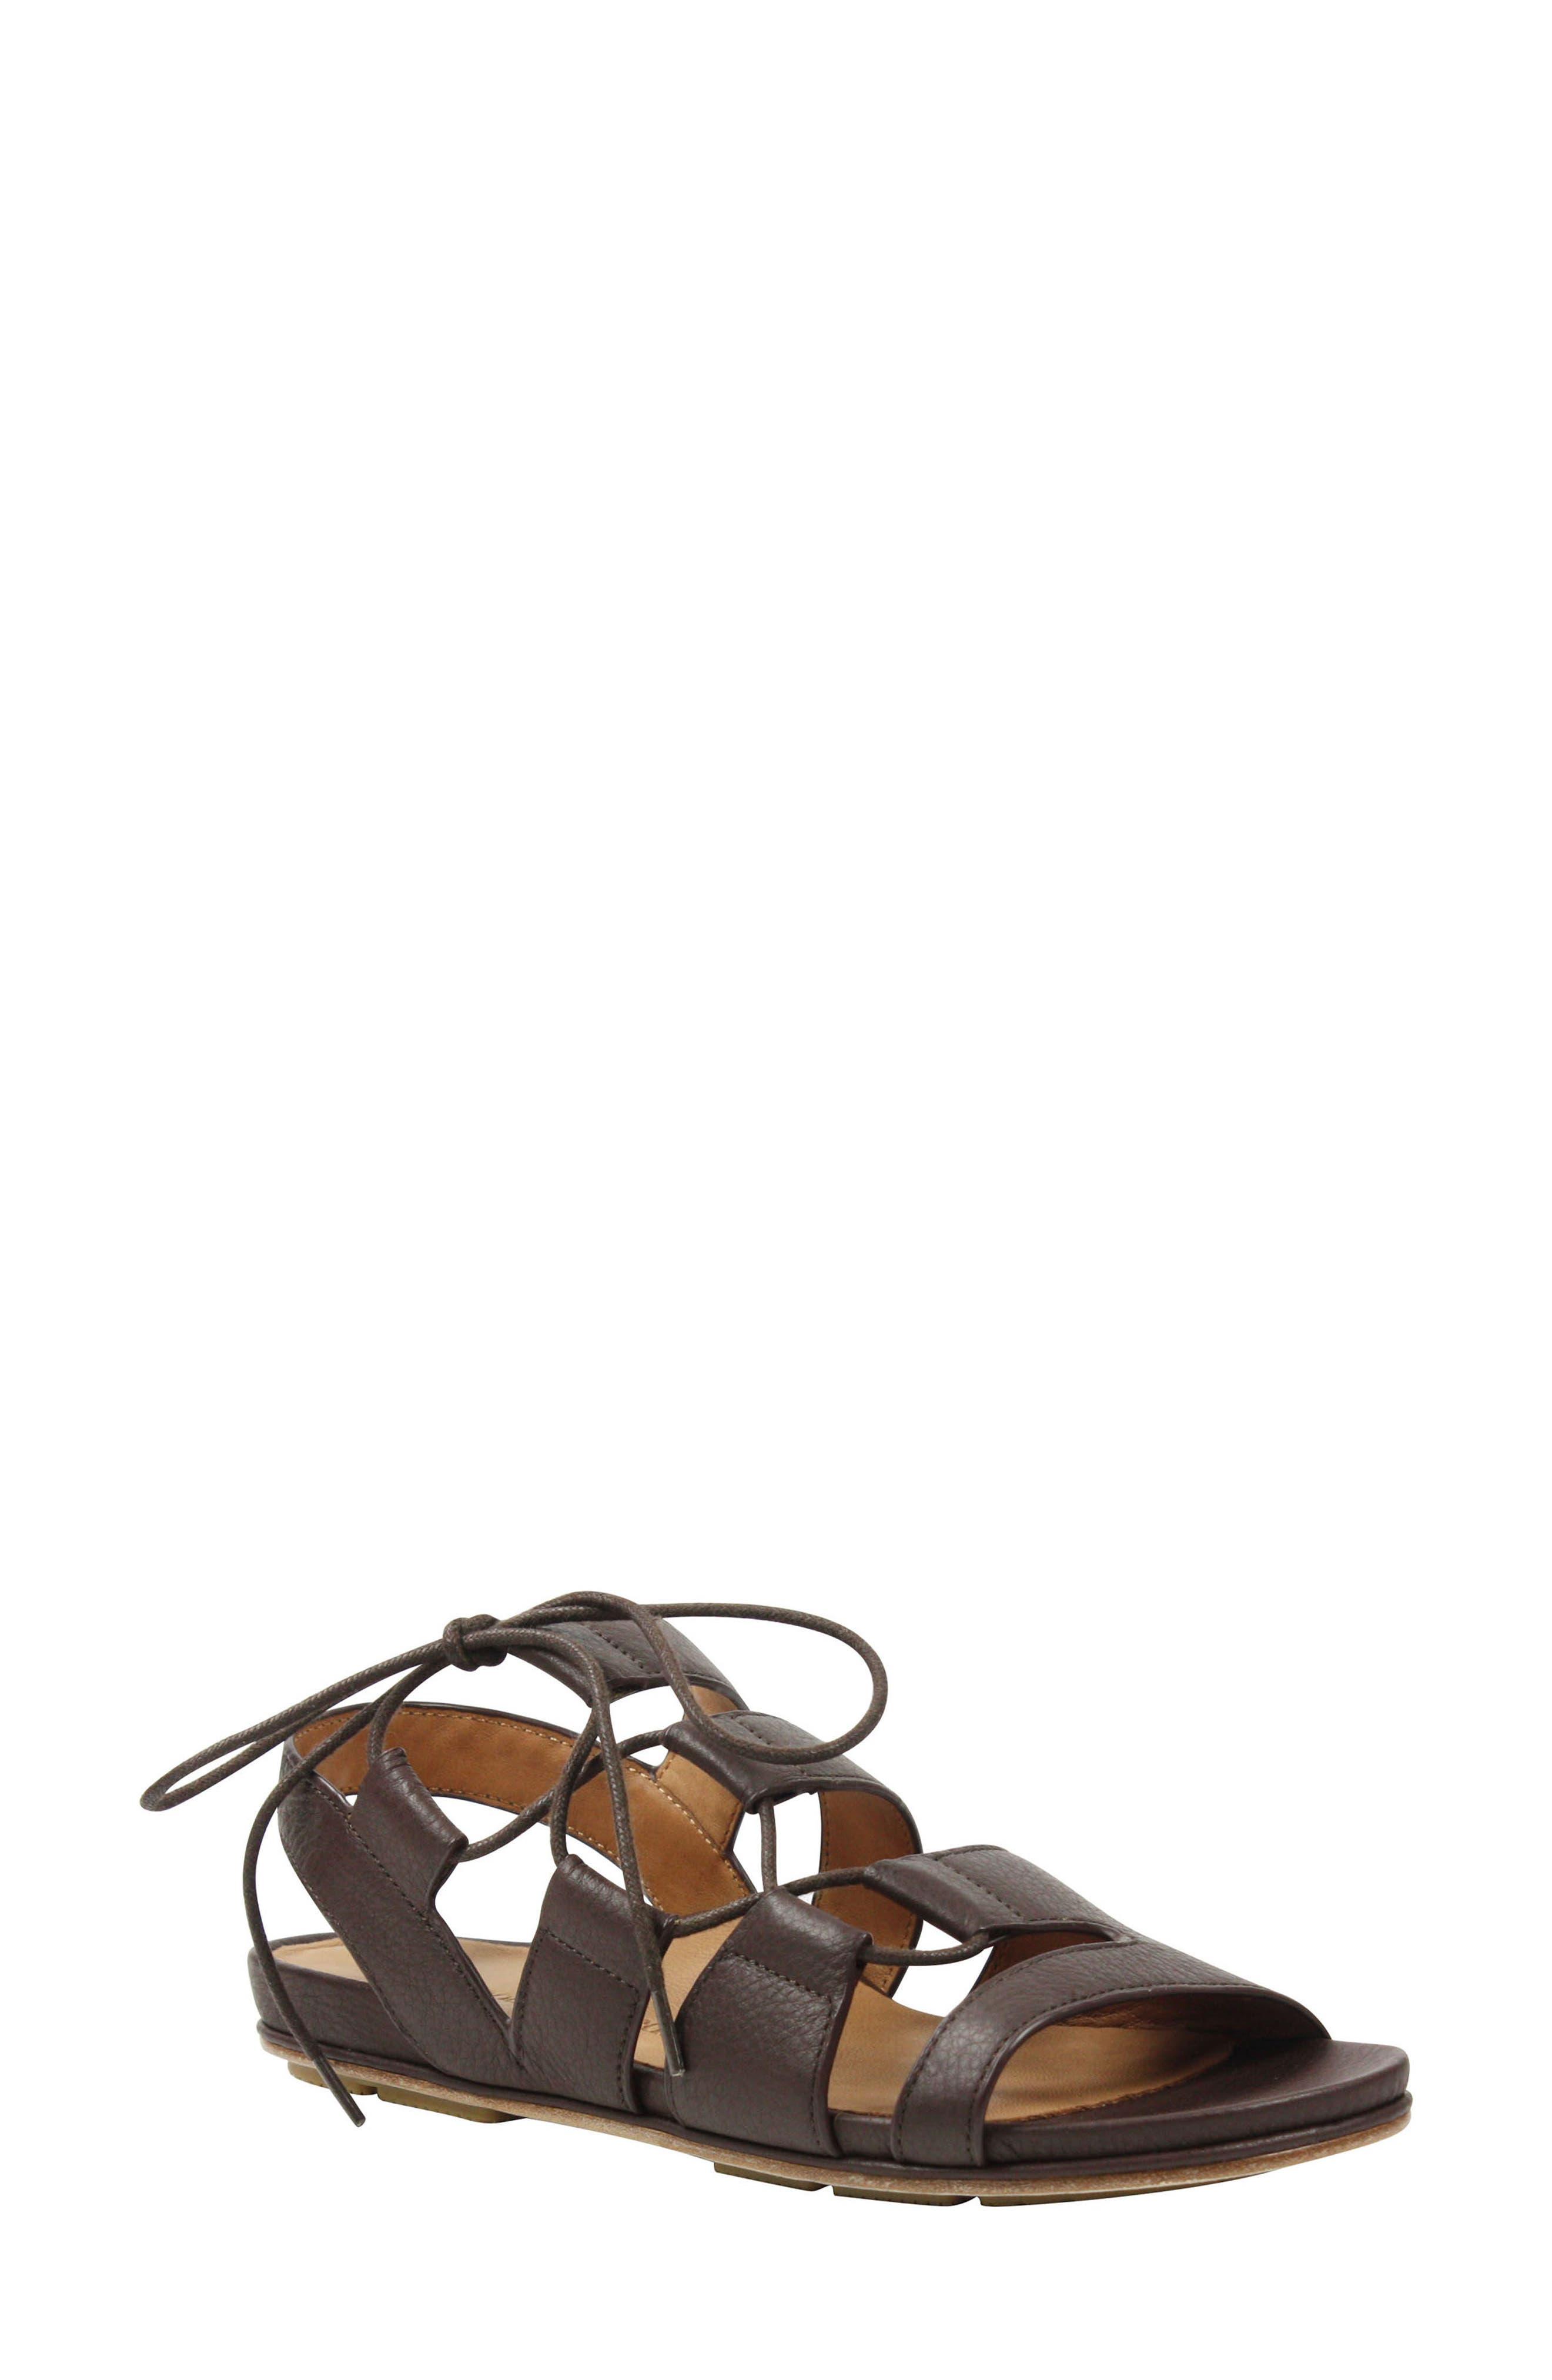 L'AMOUR DES PIEDS Digbee Sandal, Main, color, ESPRESSO LEATHER